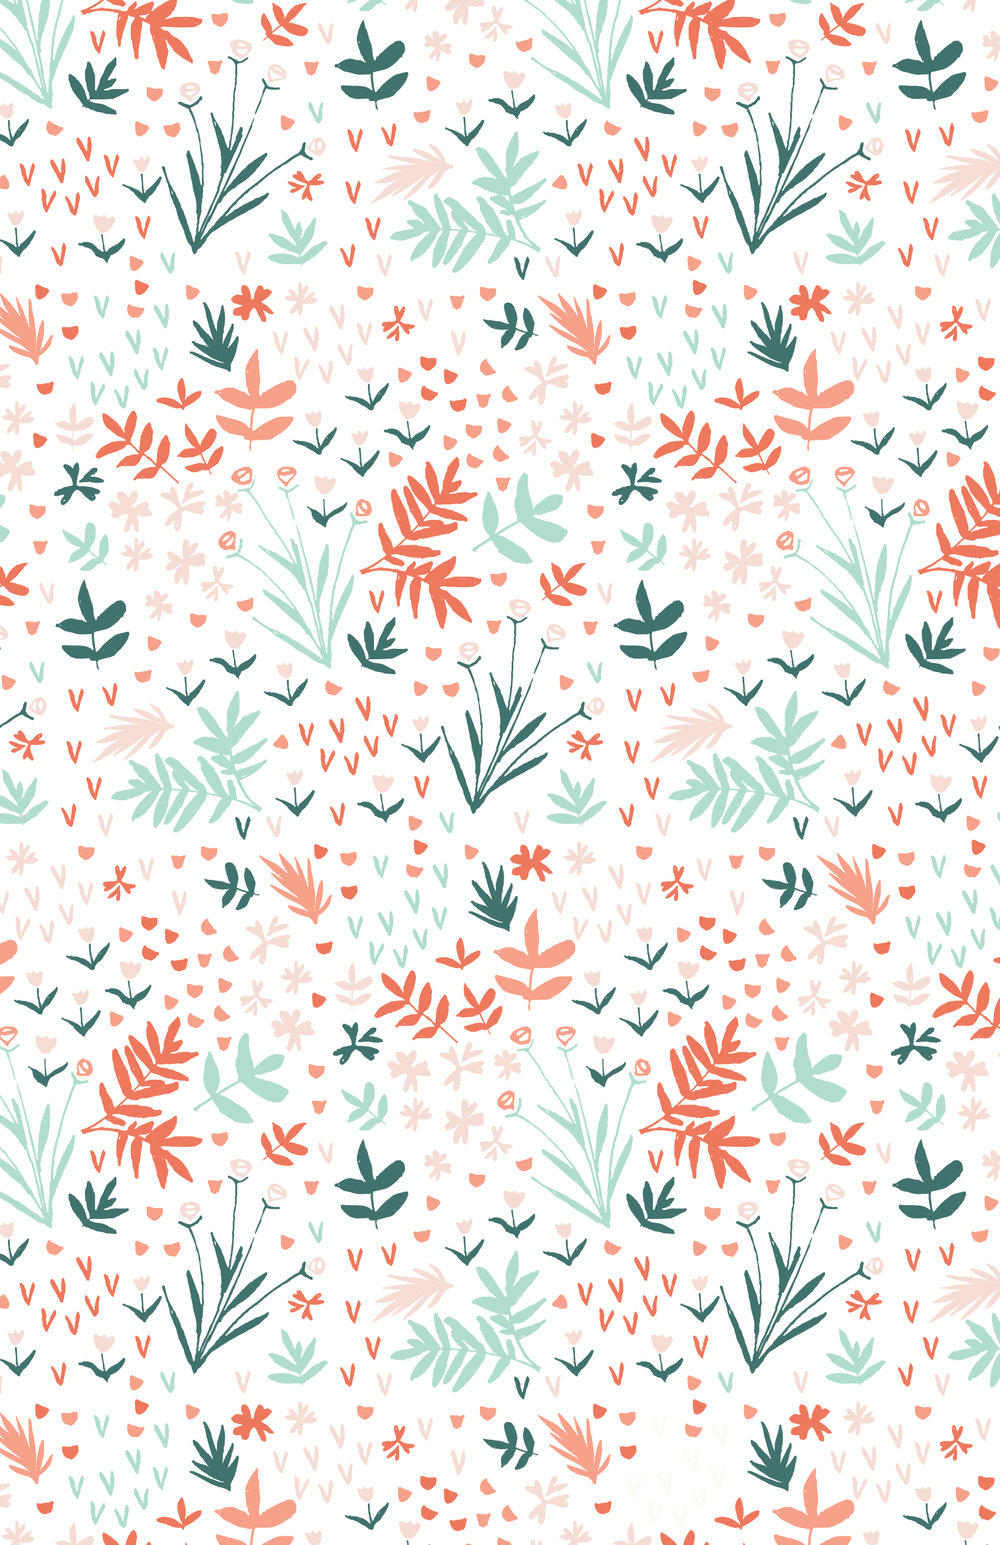 pattern60-01.jpg